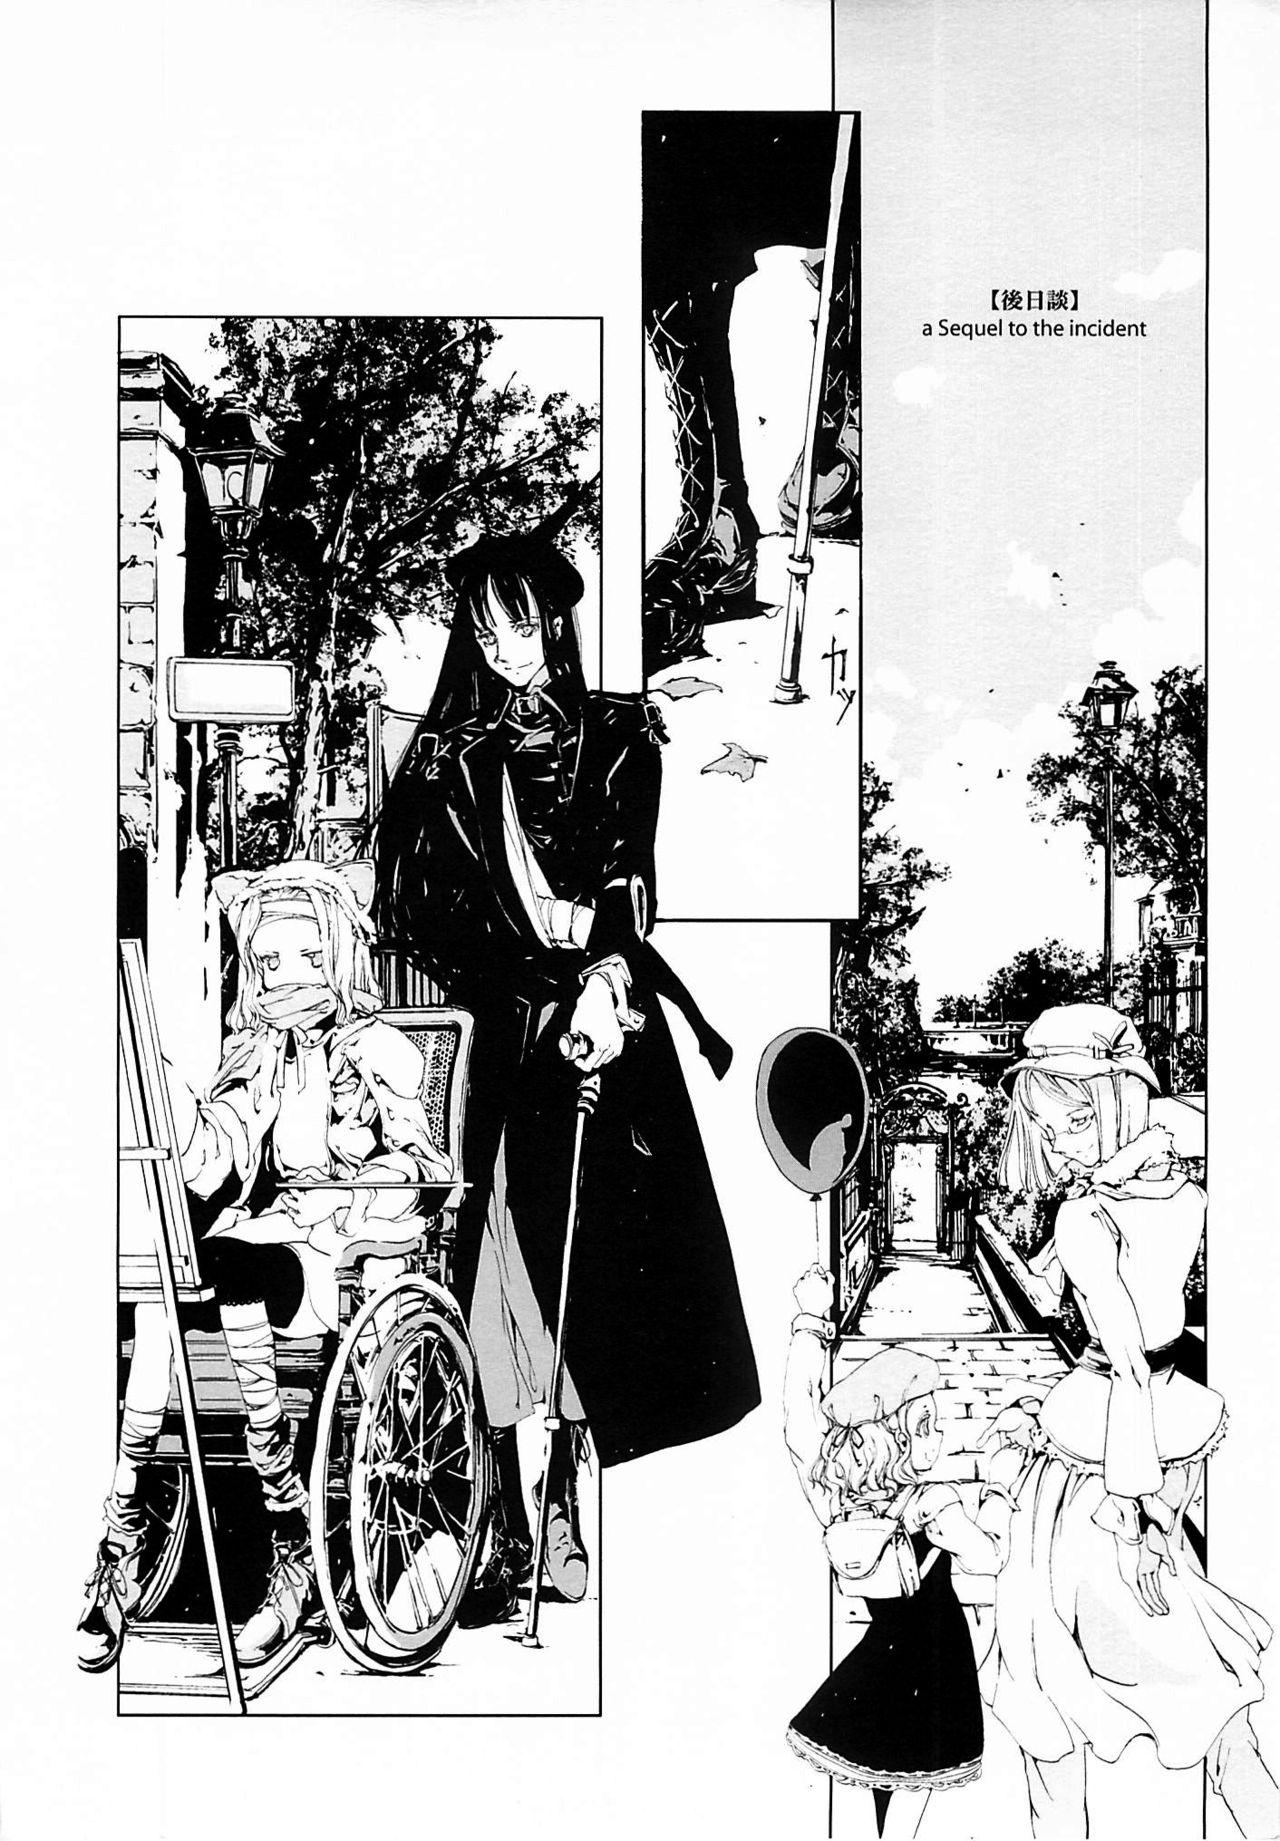 (CR37) [70 Nenshiki Yuukyuu Kikan (Endou Okito)] ORGAN-Tino  01-02[Chinese] [拾荒者汉化组] [Incomplete] 59